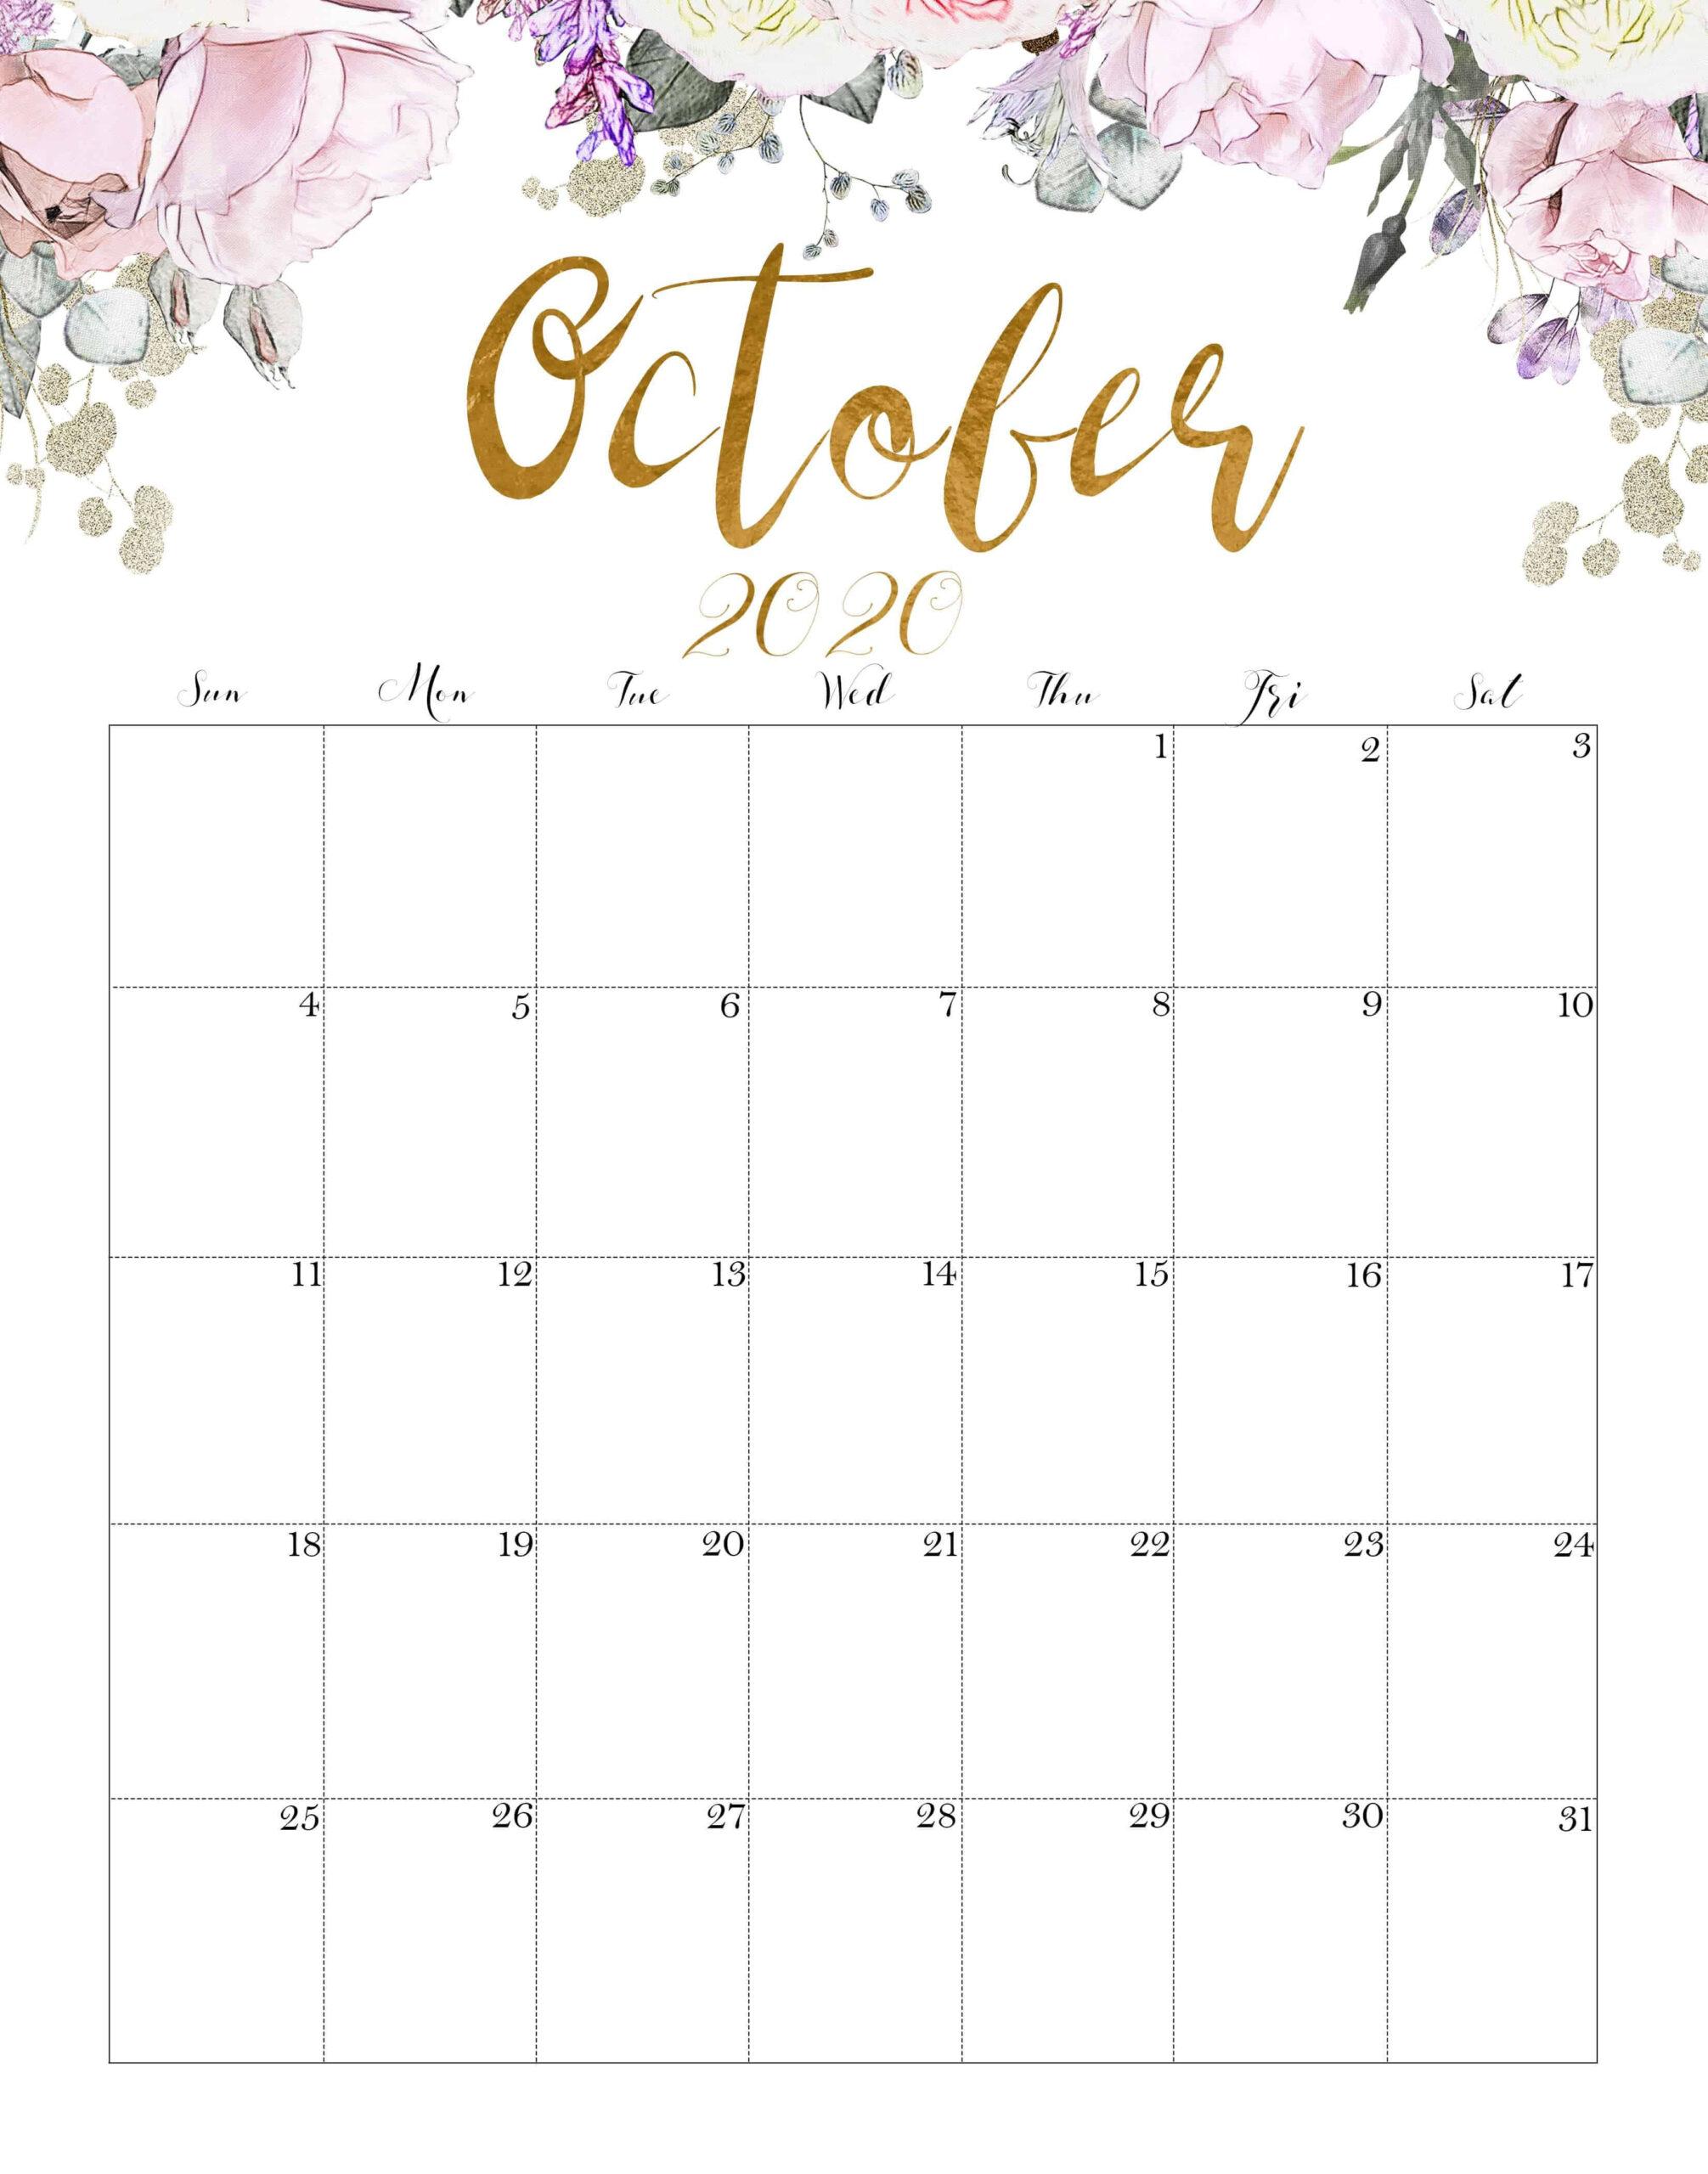 2021 Calendar Printable Designs June-December